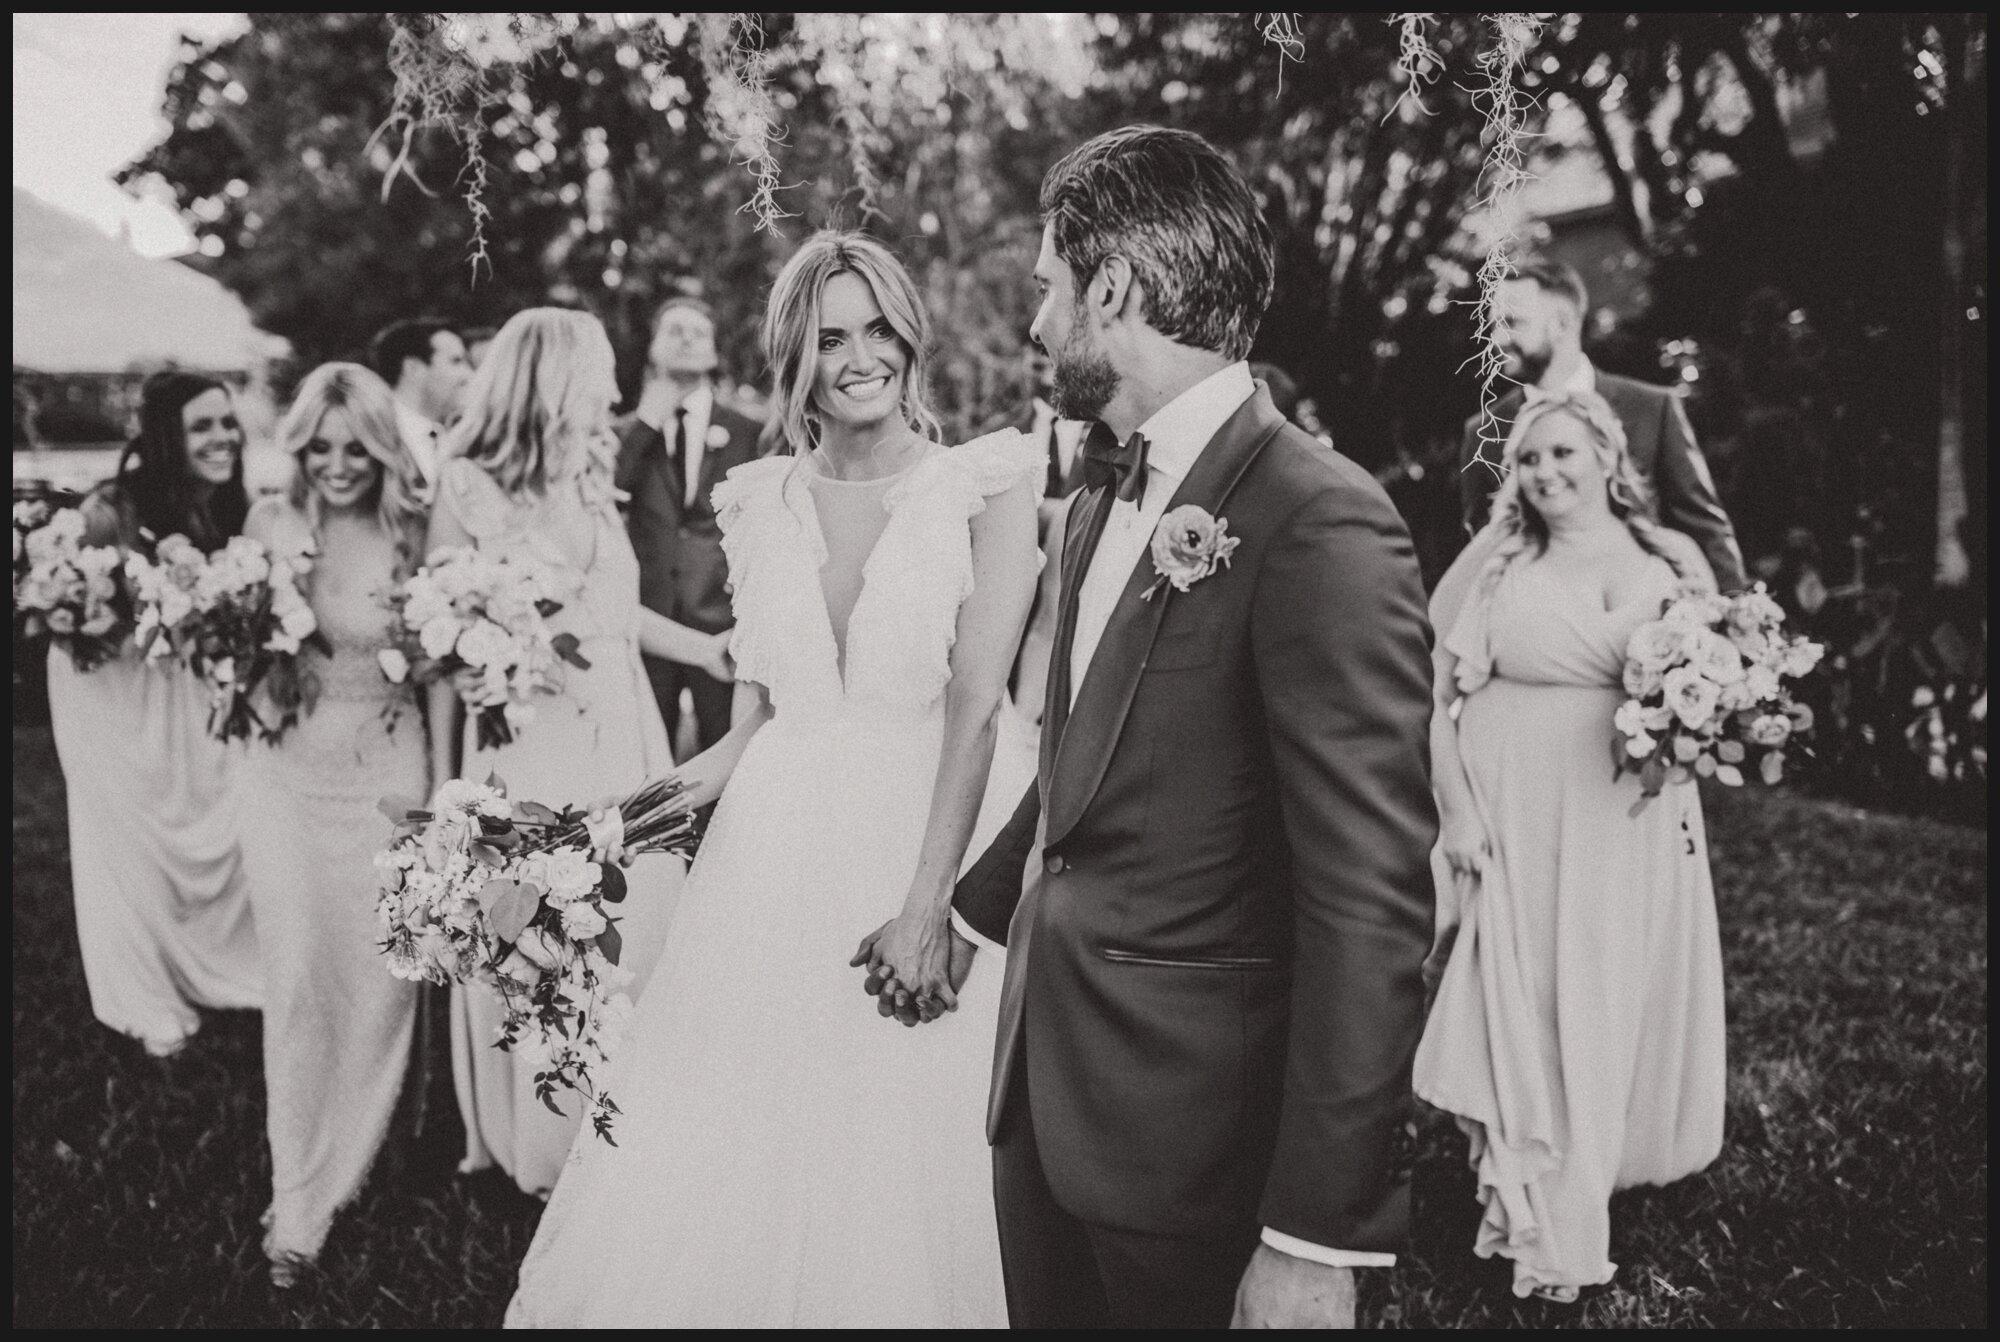 Orlando-Wedding-Photographer-destination-wedding-photographer-florida-wedding-photographer-hawaii-wedding-photographer_0759.jpg